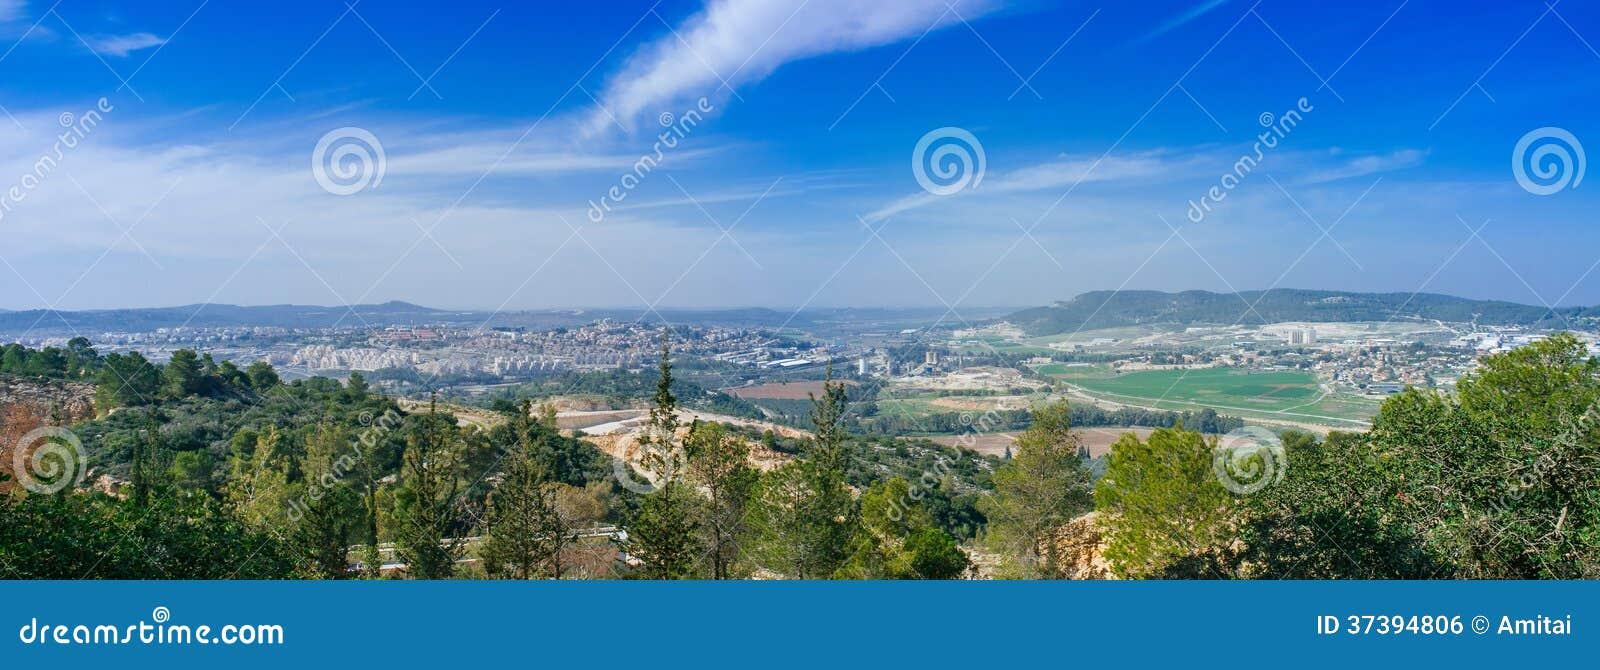 Serie de Holyland - panorama de las montañas de Judea